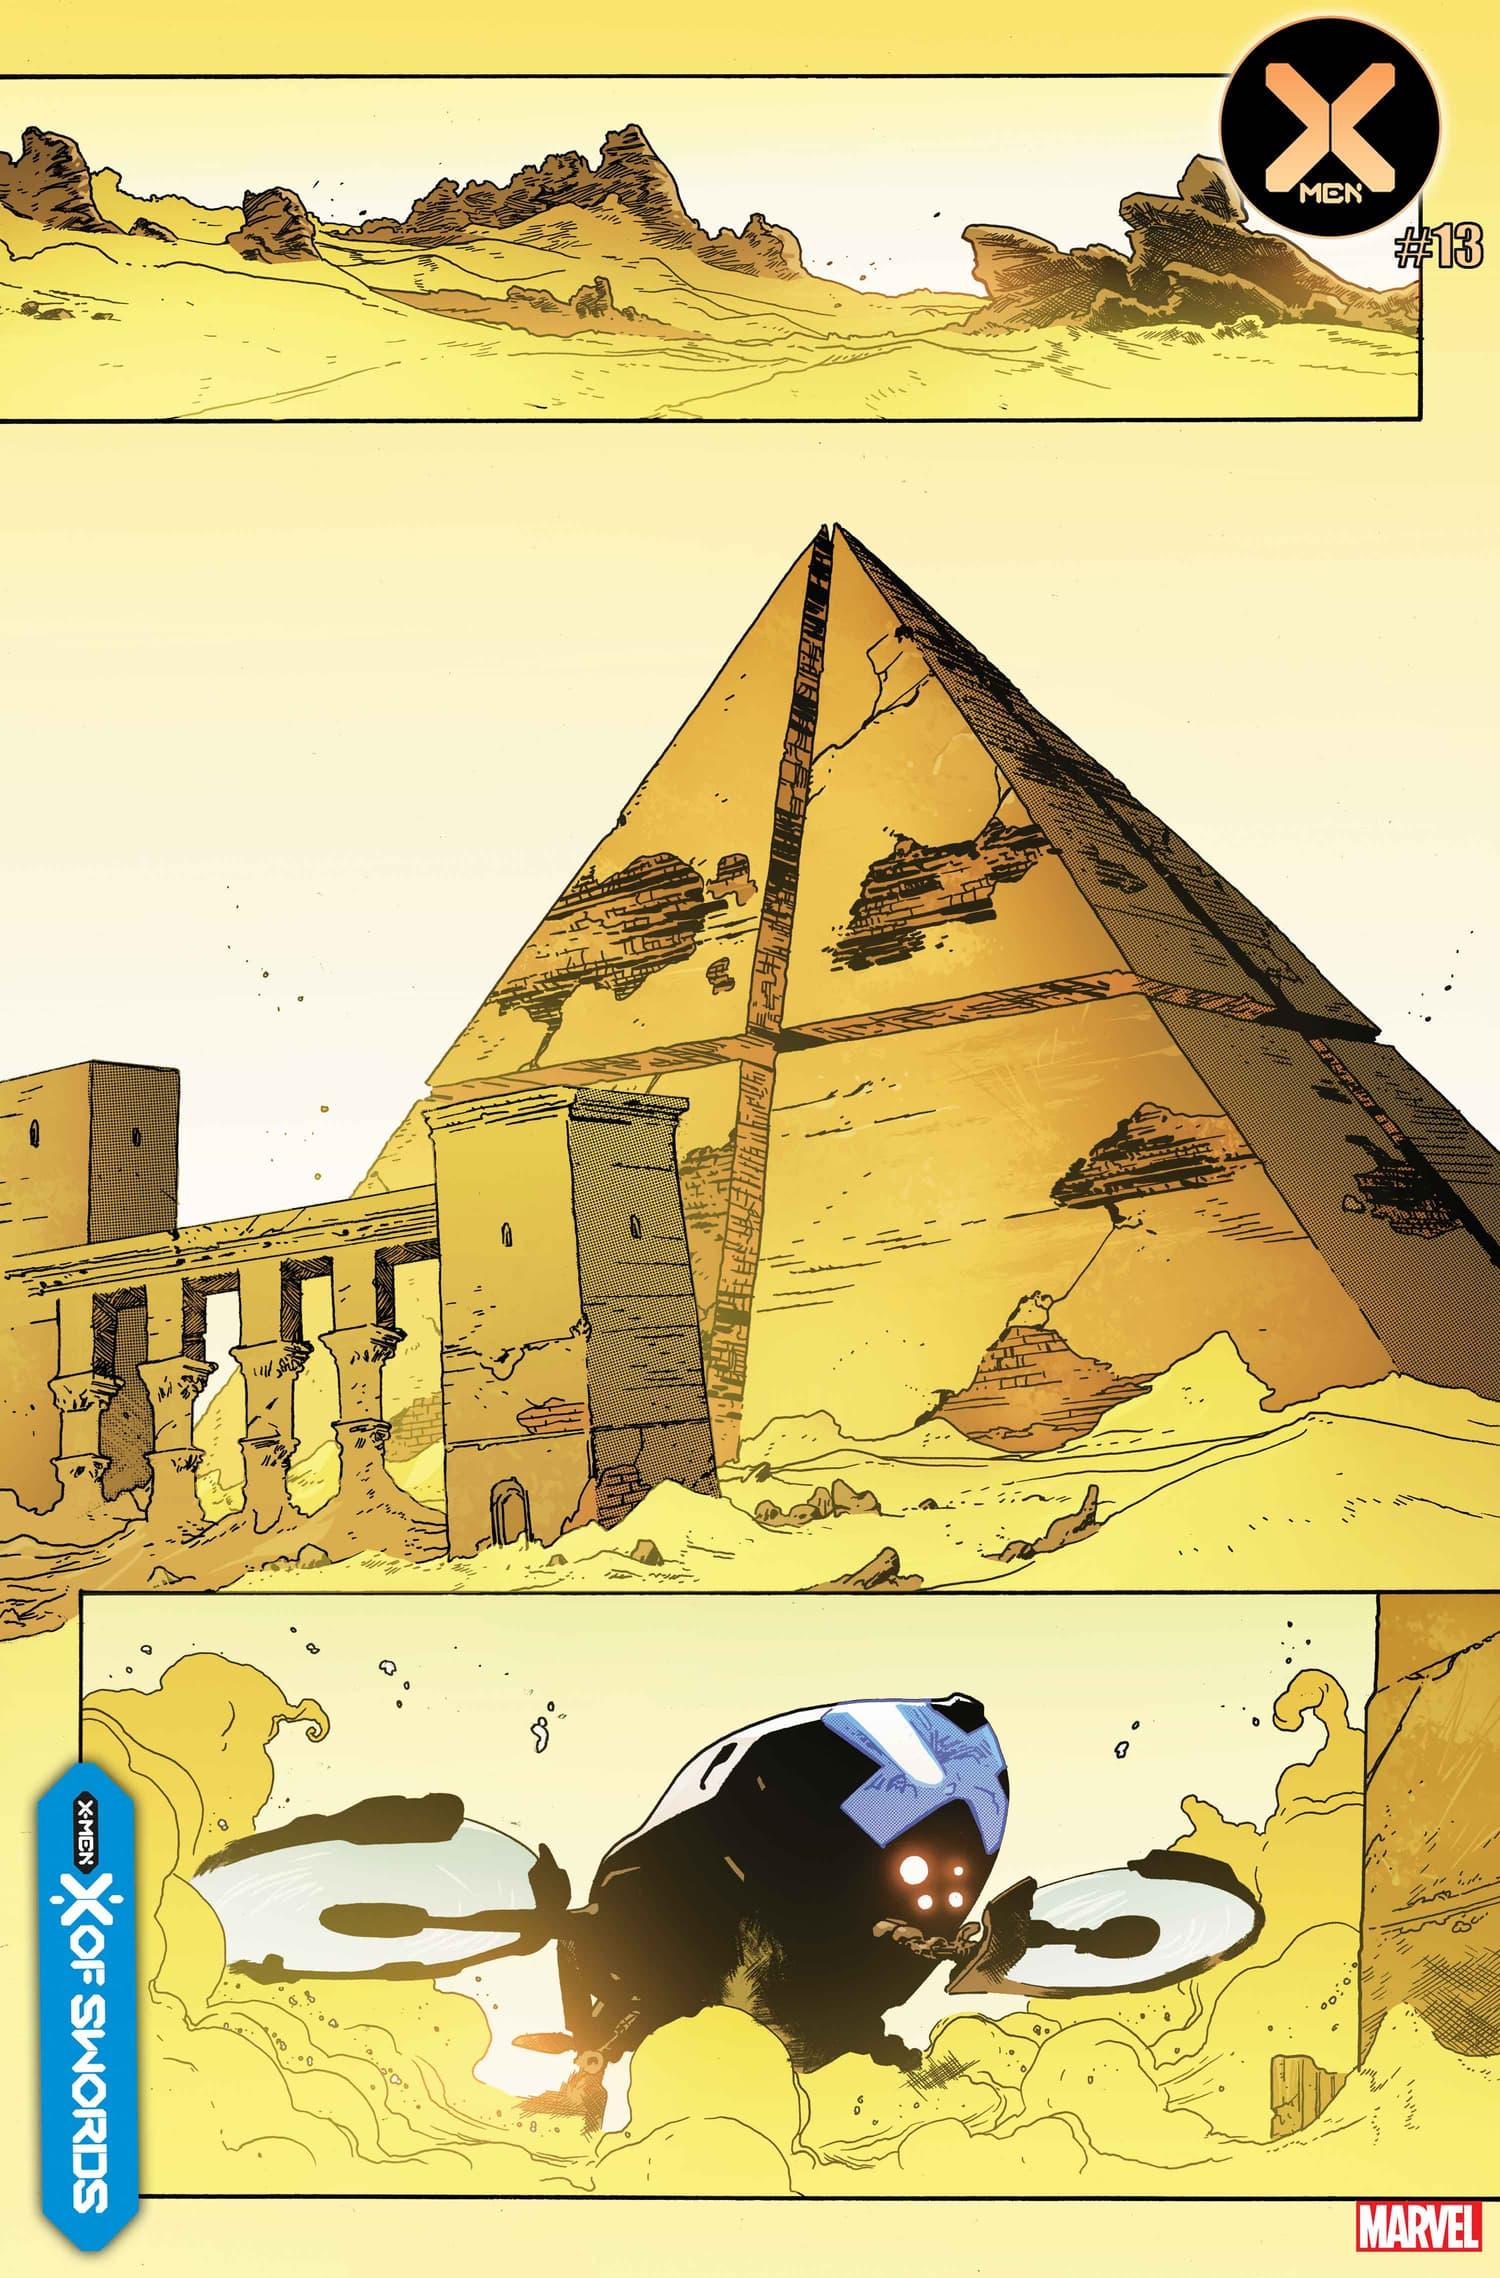 X-Men #13 preview by Mahmud Asrar